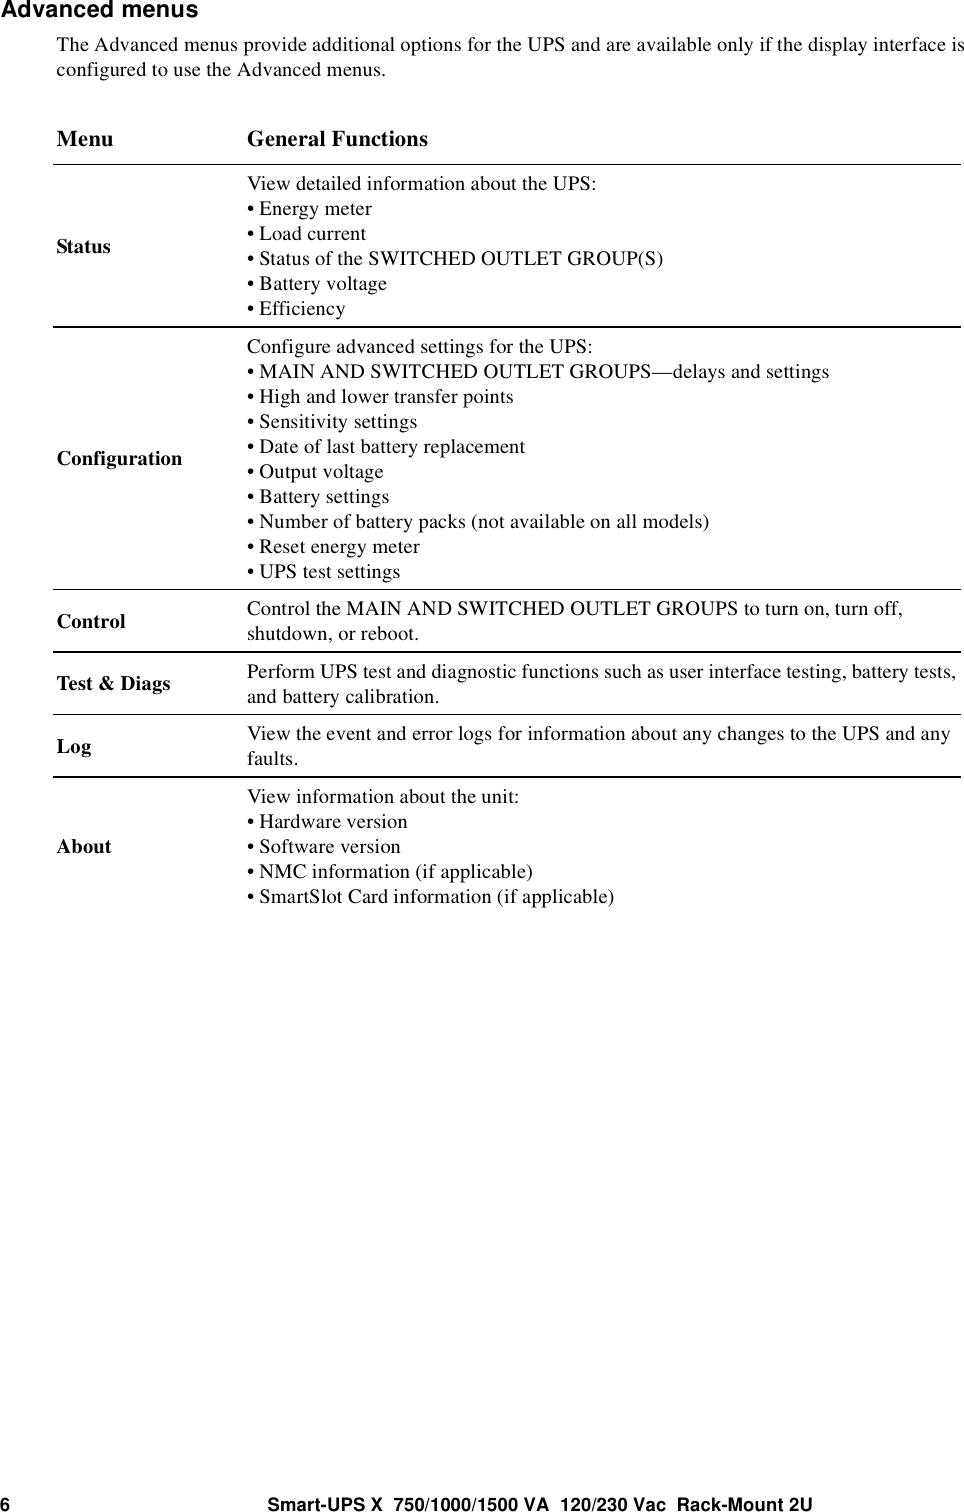 Apc Smart Ups Smx 1500 Va Users Manual SU UM 990 3458 MN01 EN